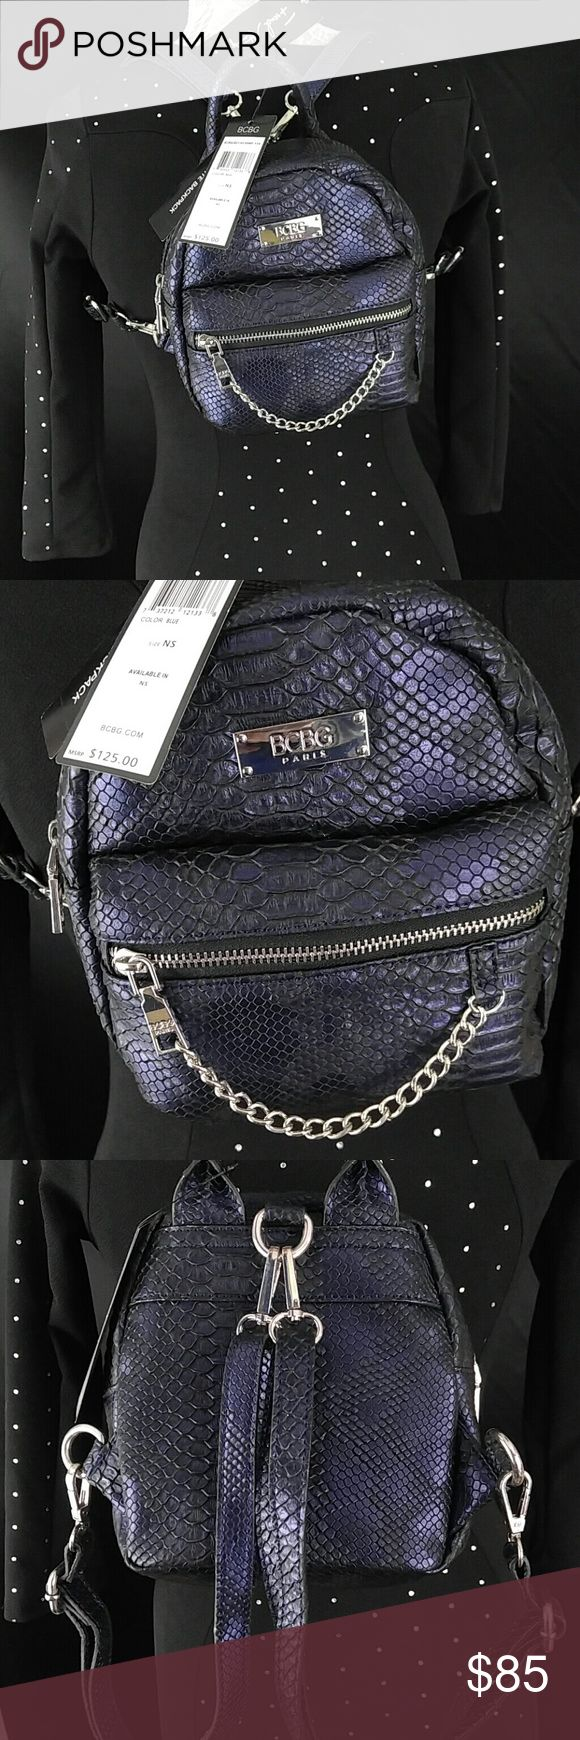 NWT BCBG petite backpack blue NWT BCBG petite backpack blue BCBG Bags Backpacks